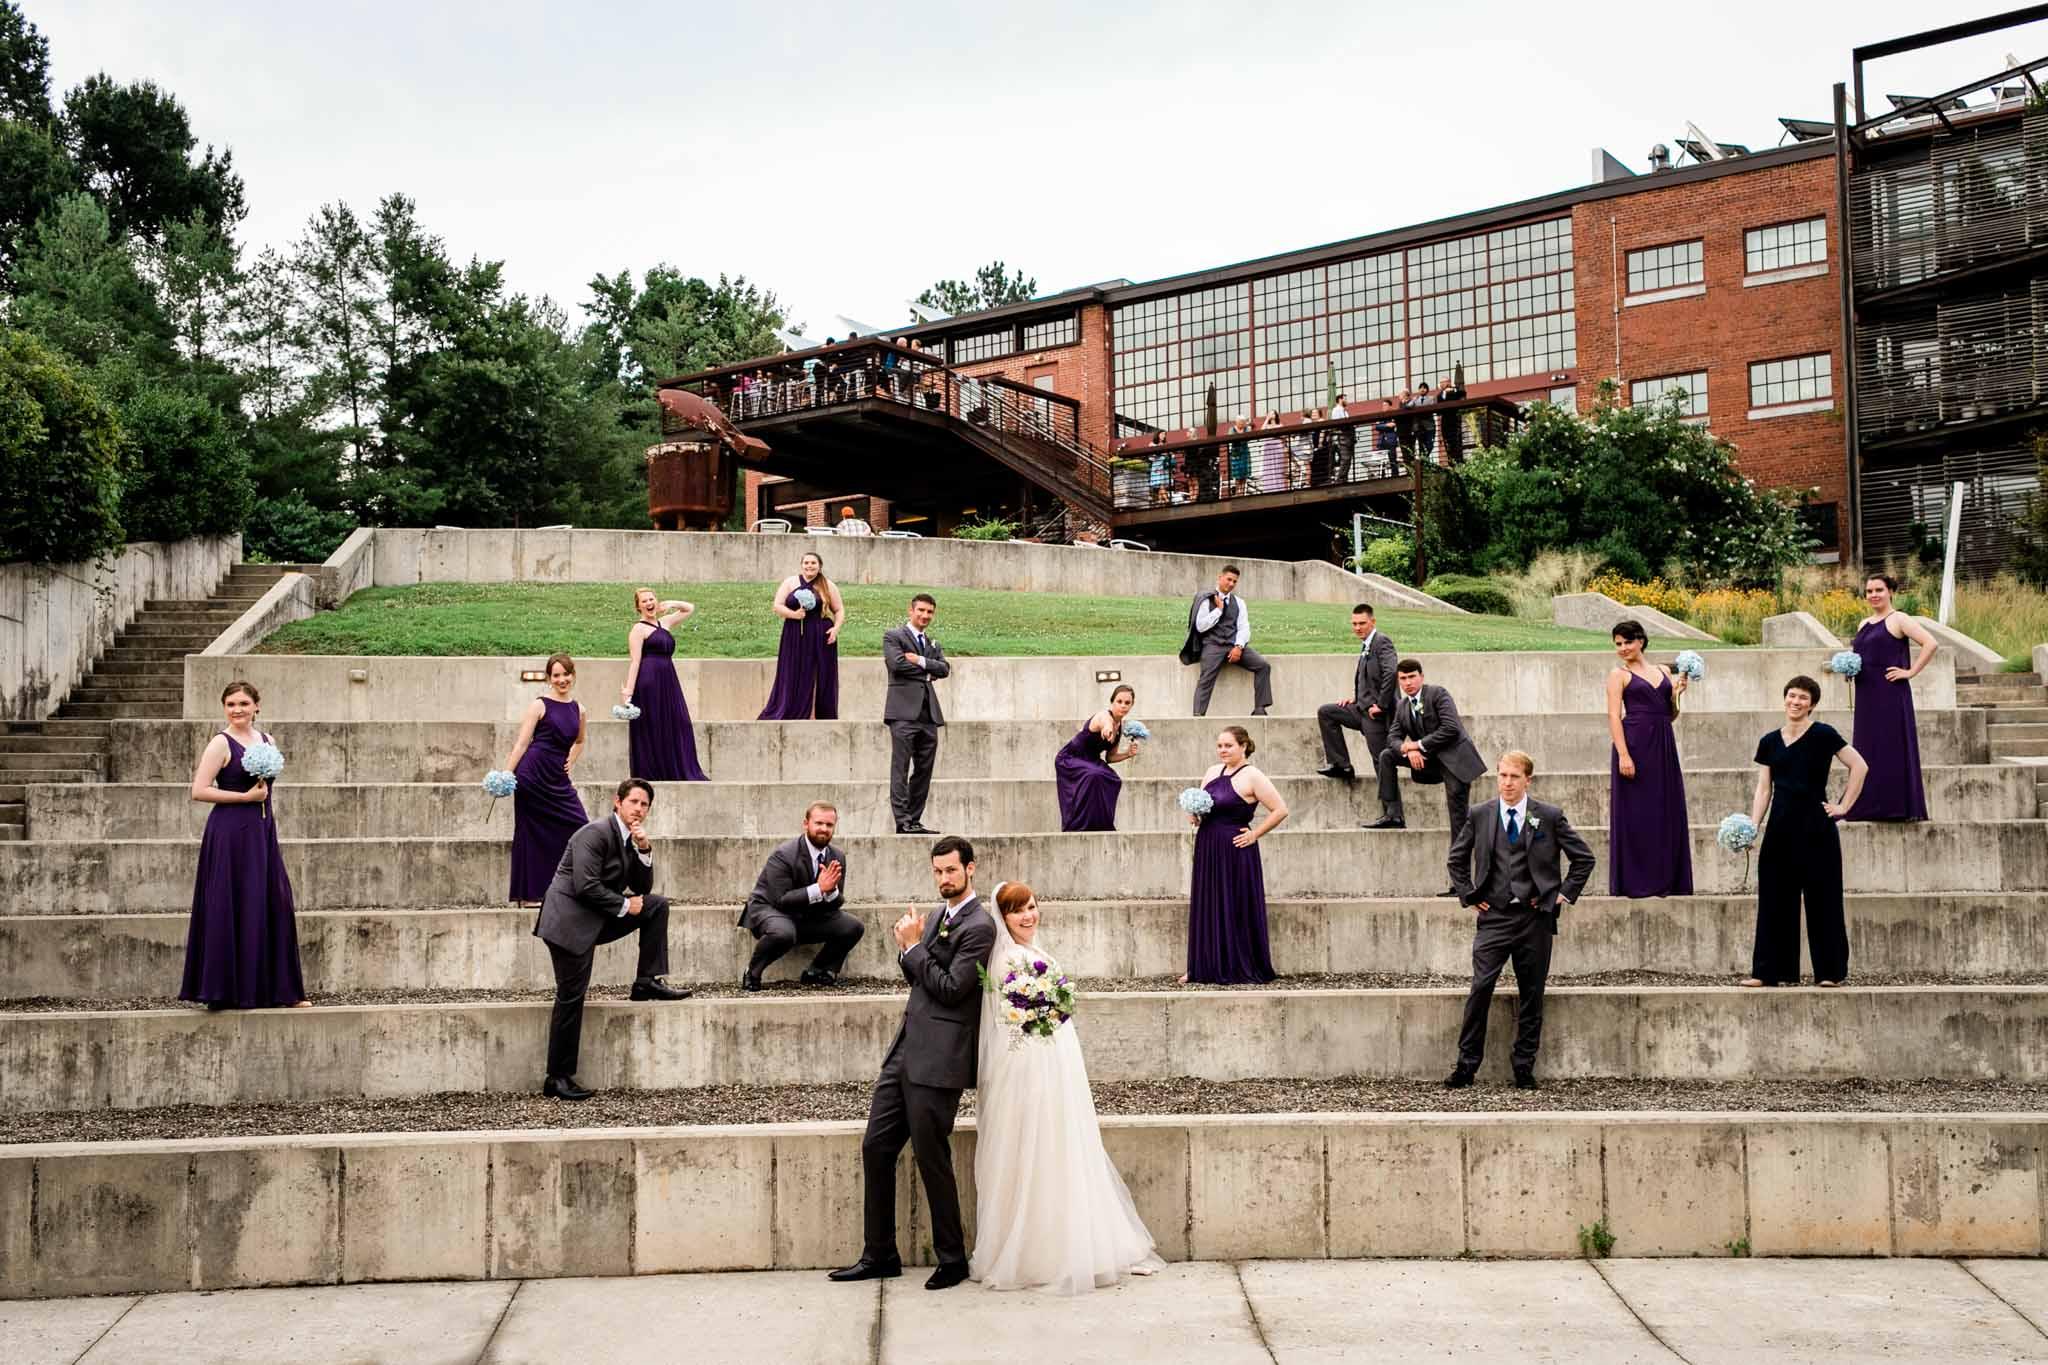 Haw River Ballroom Wedding   Portrait of wedding party   Durham Wedding Photographer   By G. Lin Photography